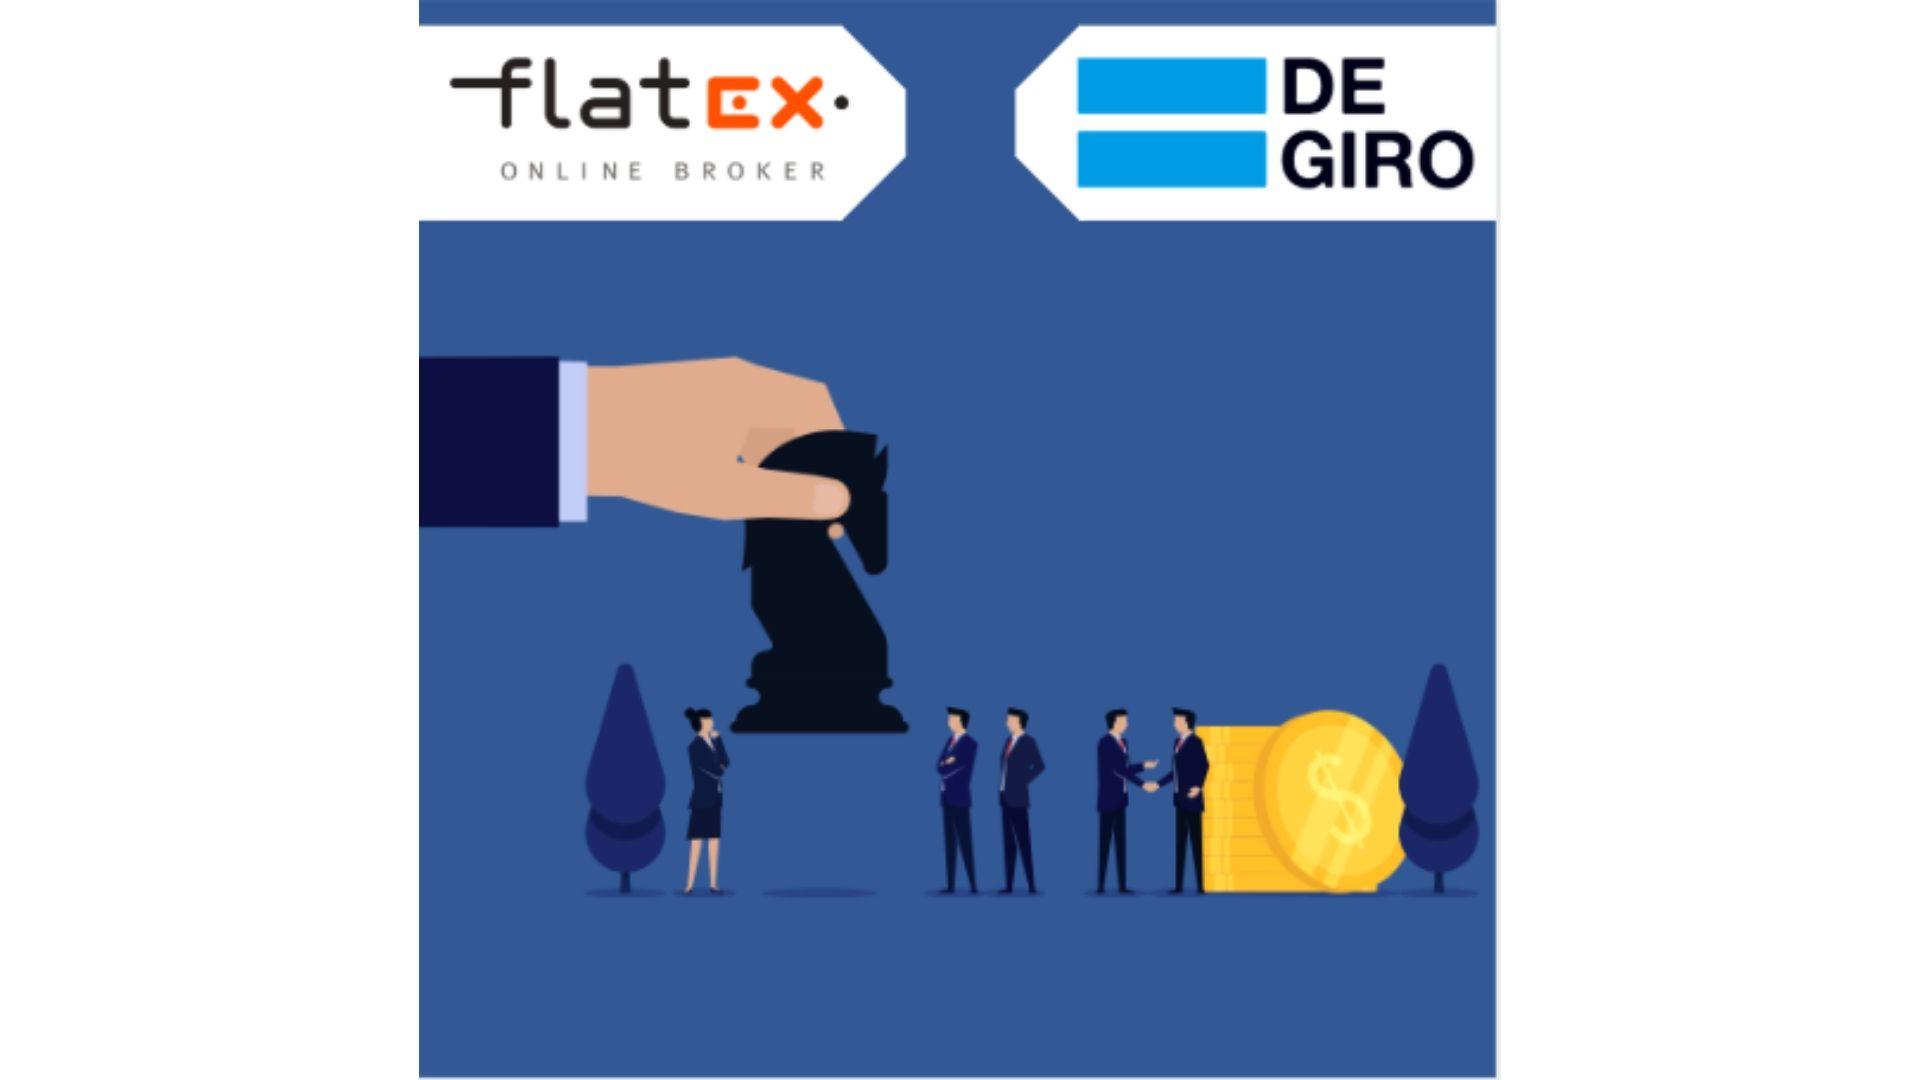 Clientes degiro compra flatex